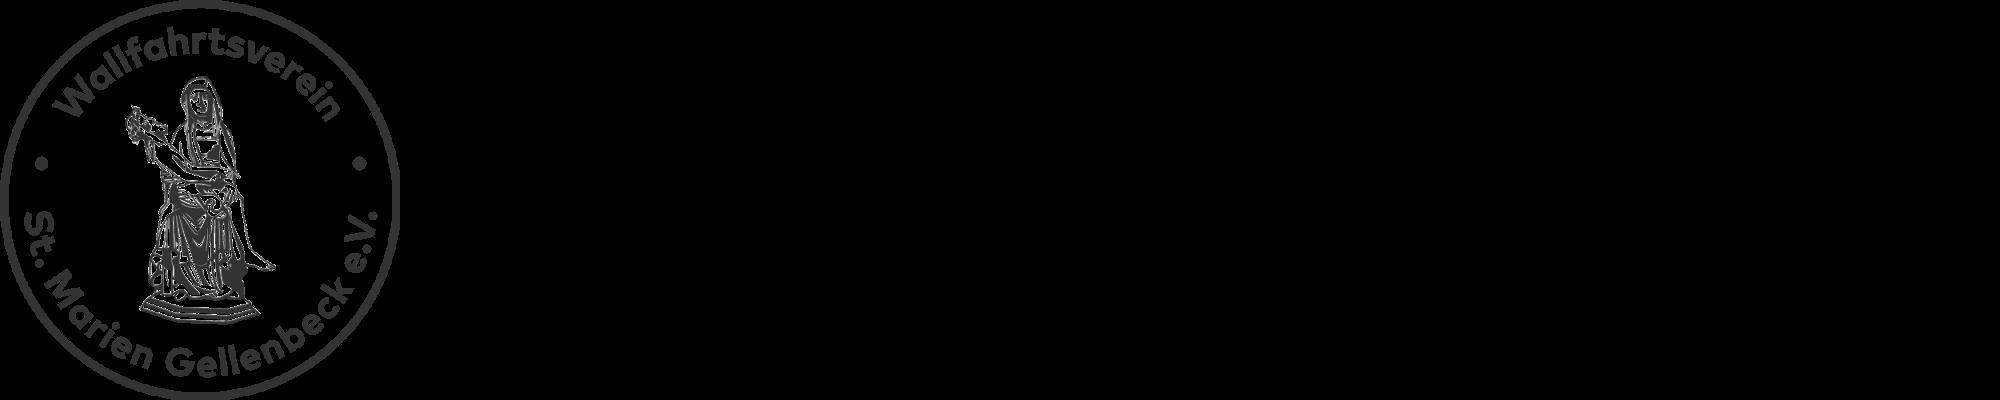 Wallfahrtsverein St. Marien Gellenbeck e.V.